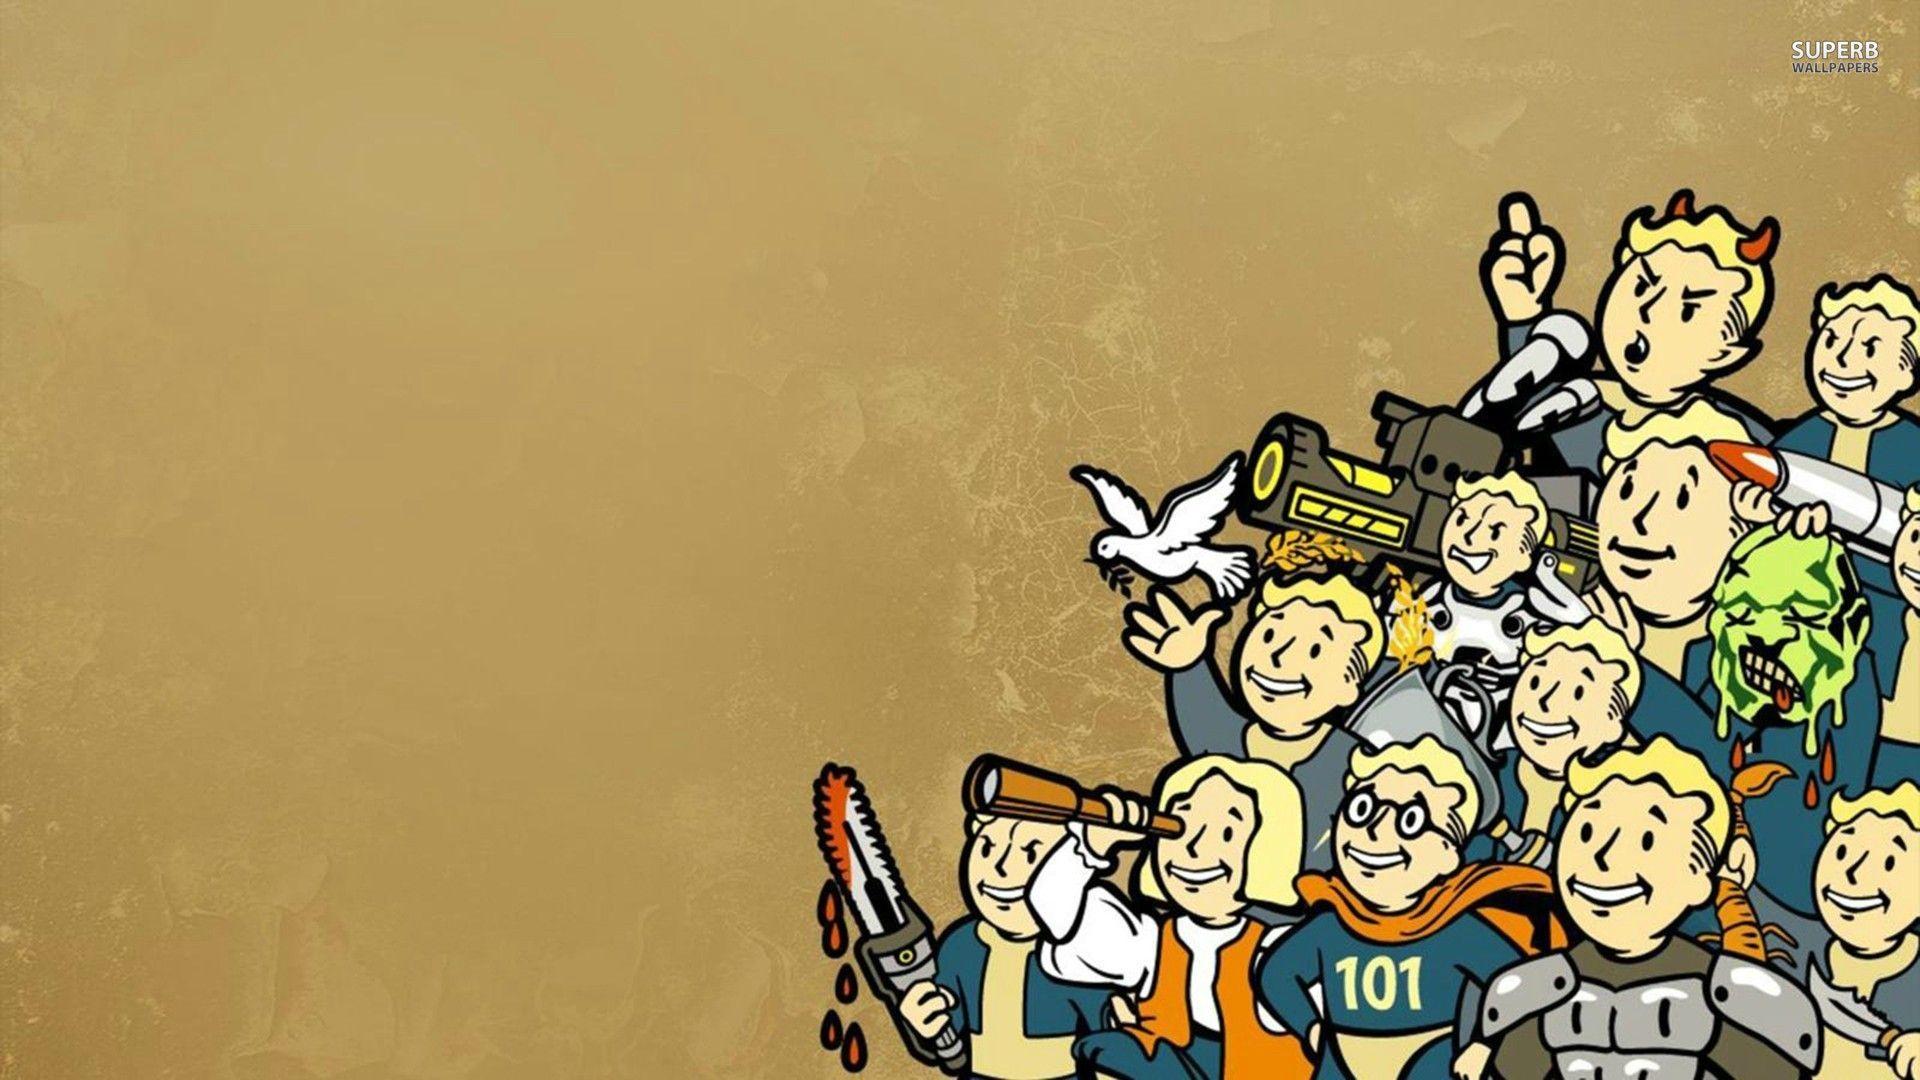 Vault Boy   Fallout wallpaper   Game wallpapers 1920x1080